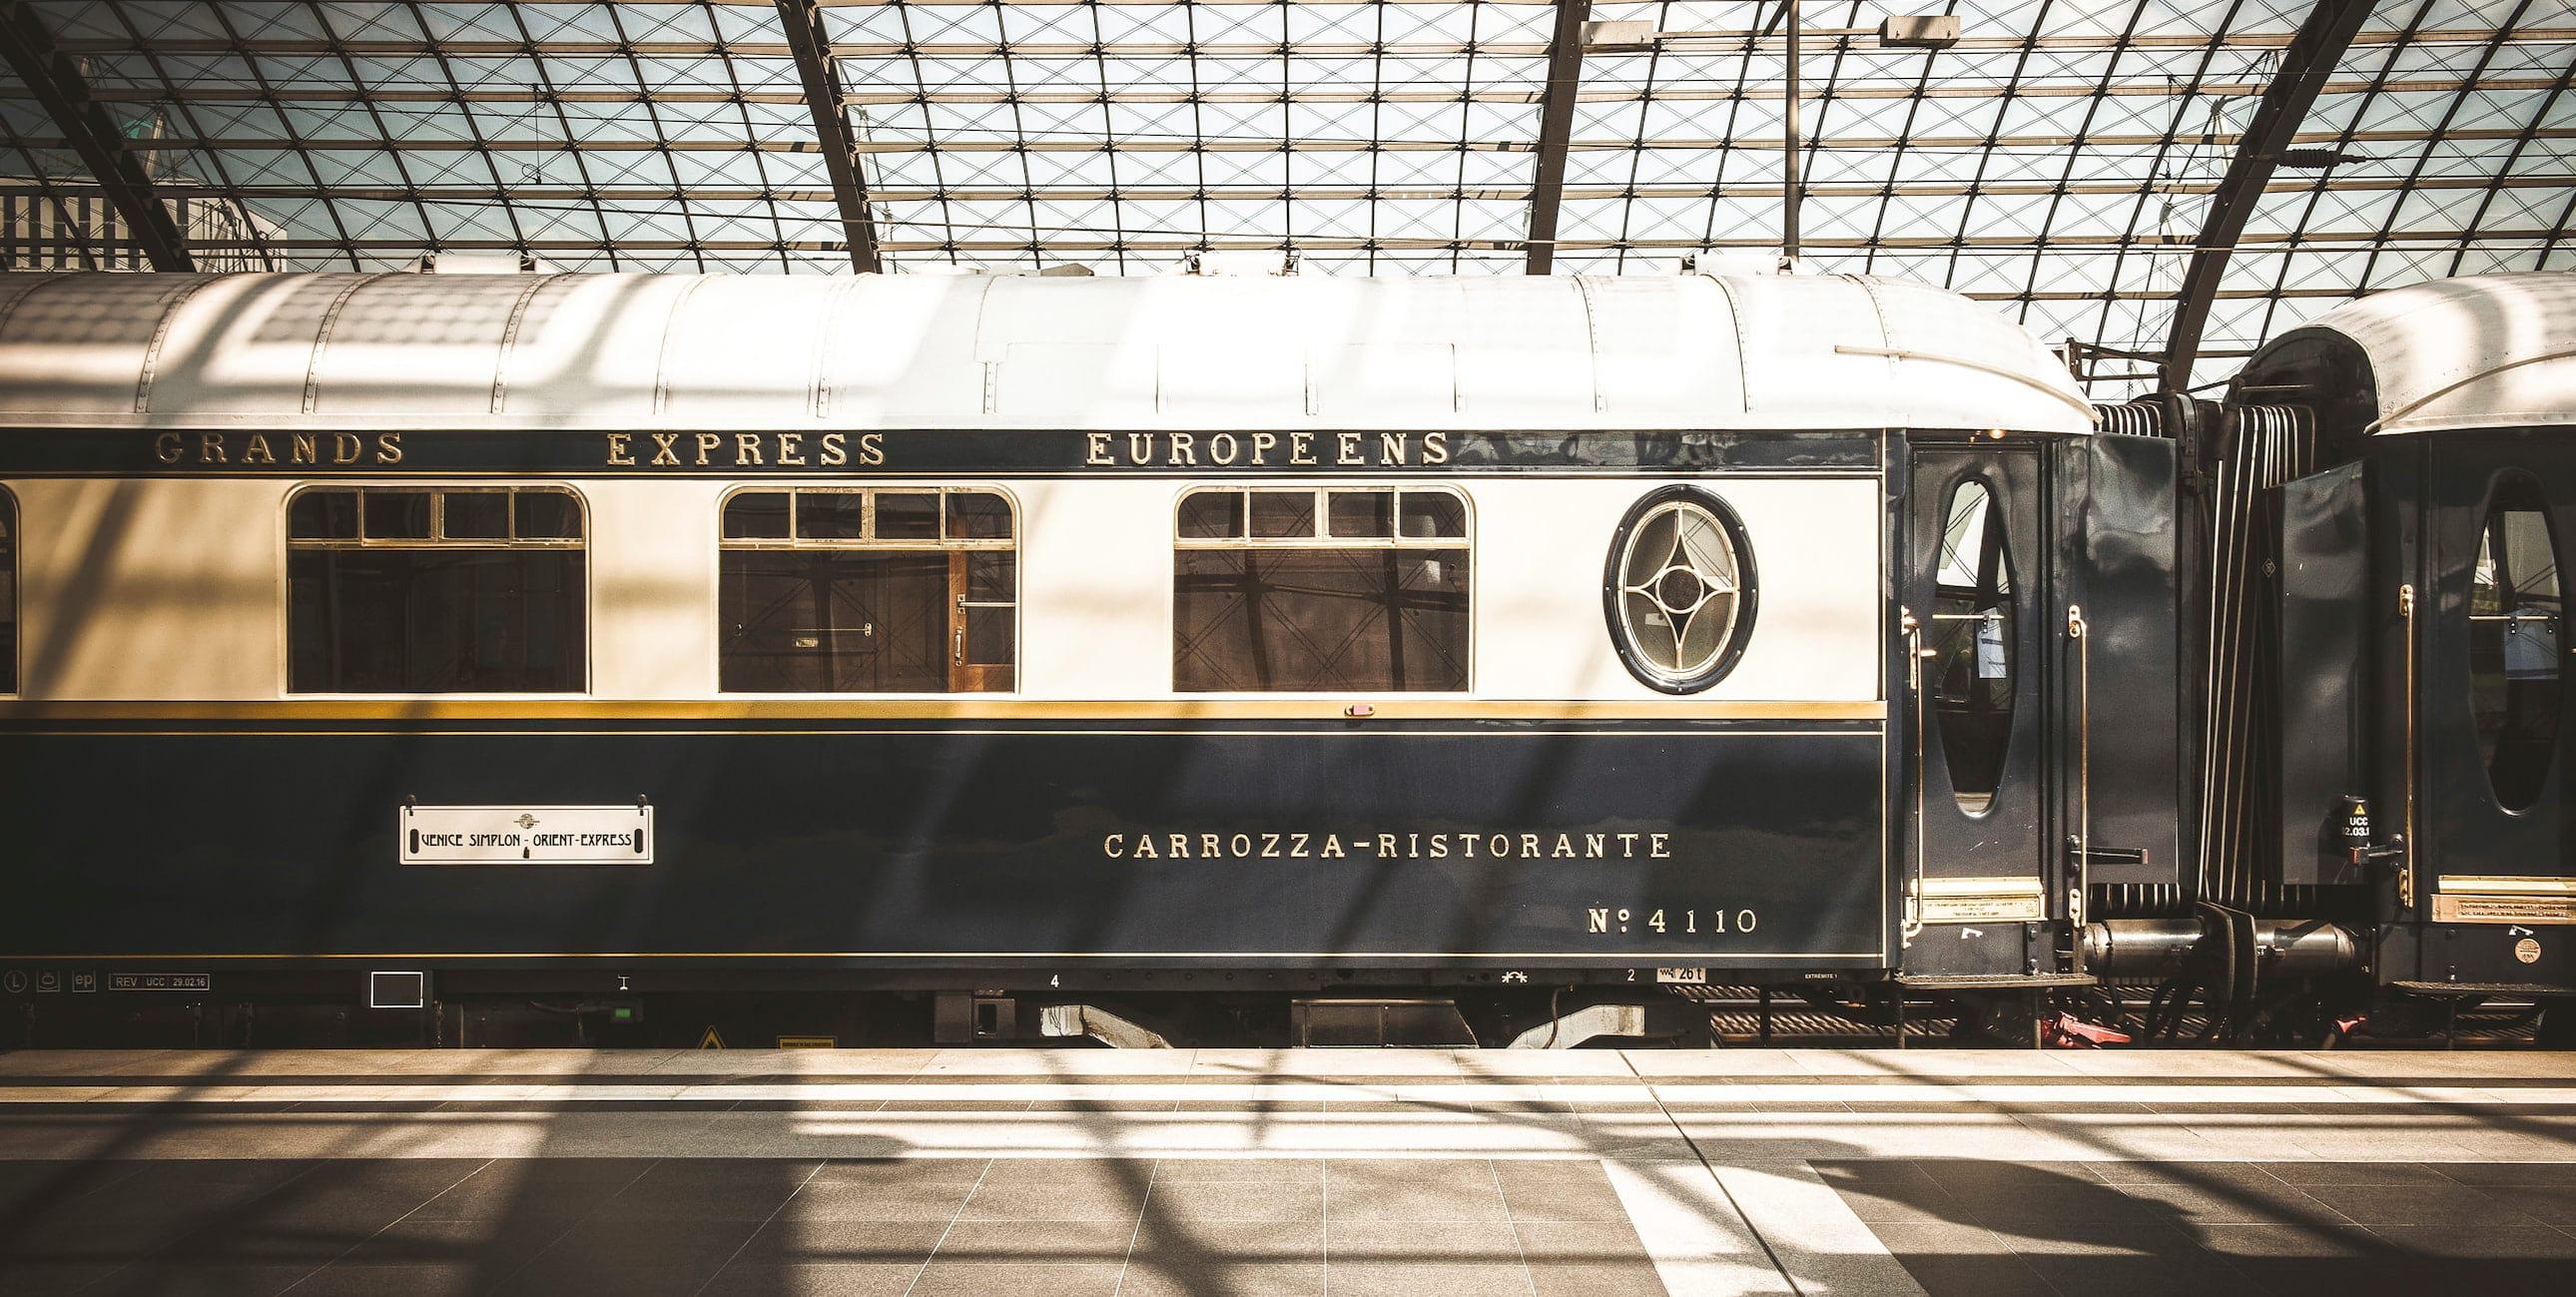 Belmond Venice Simplon Orient Express - Neomag